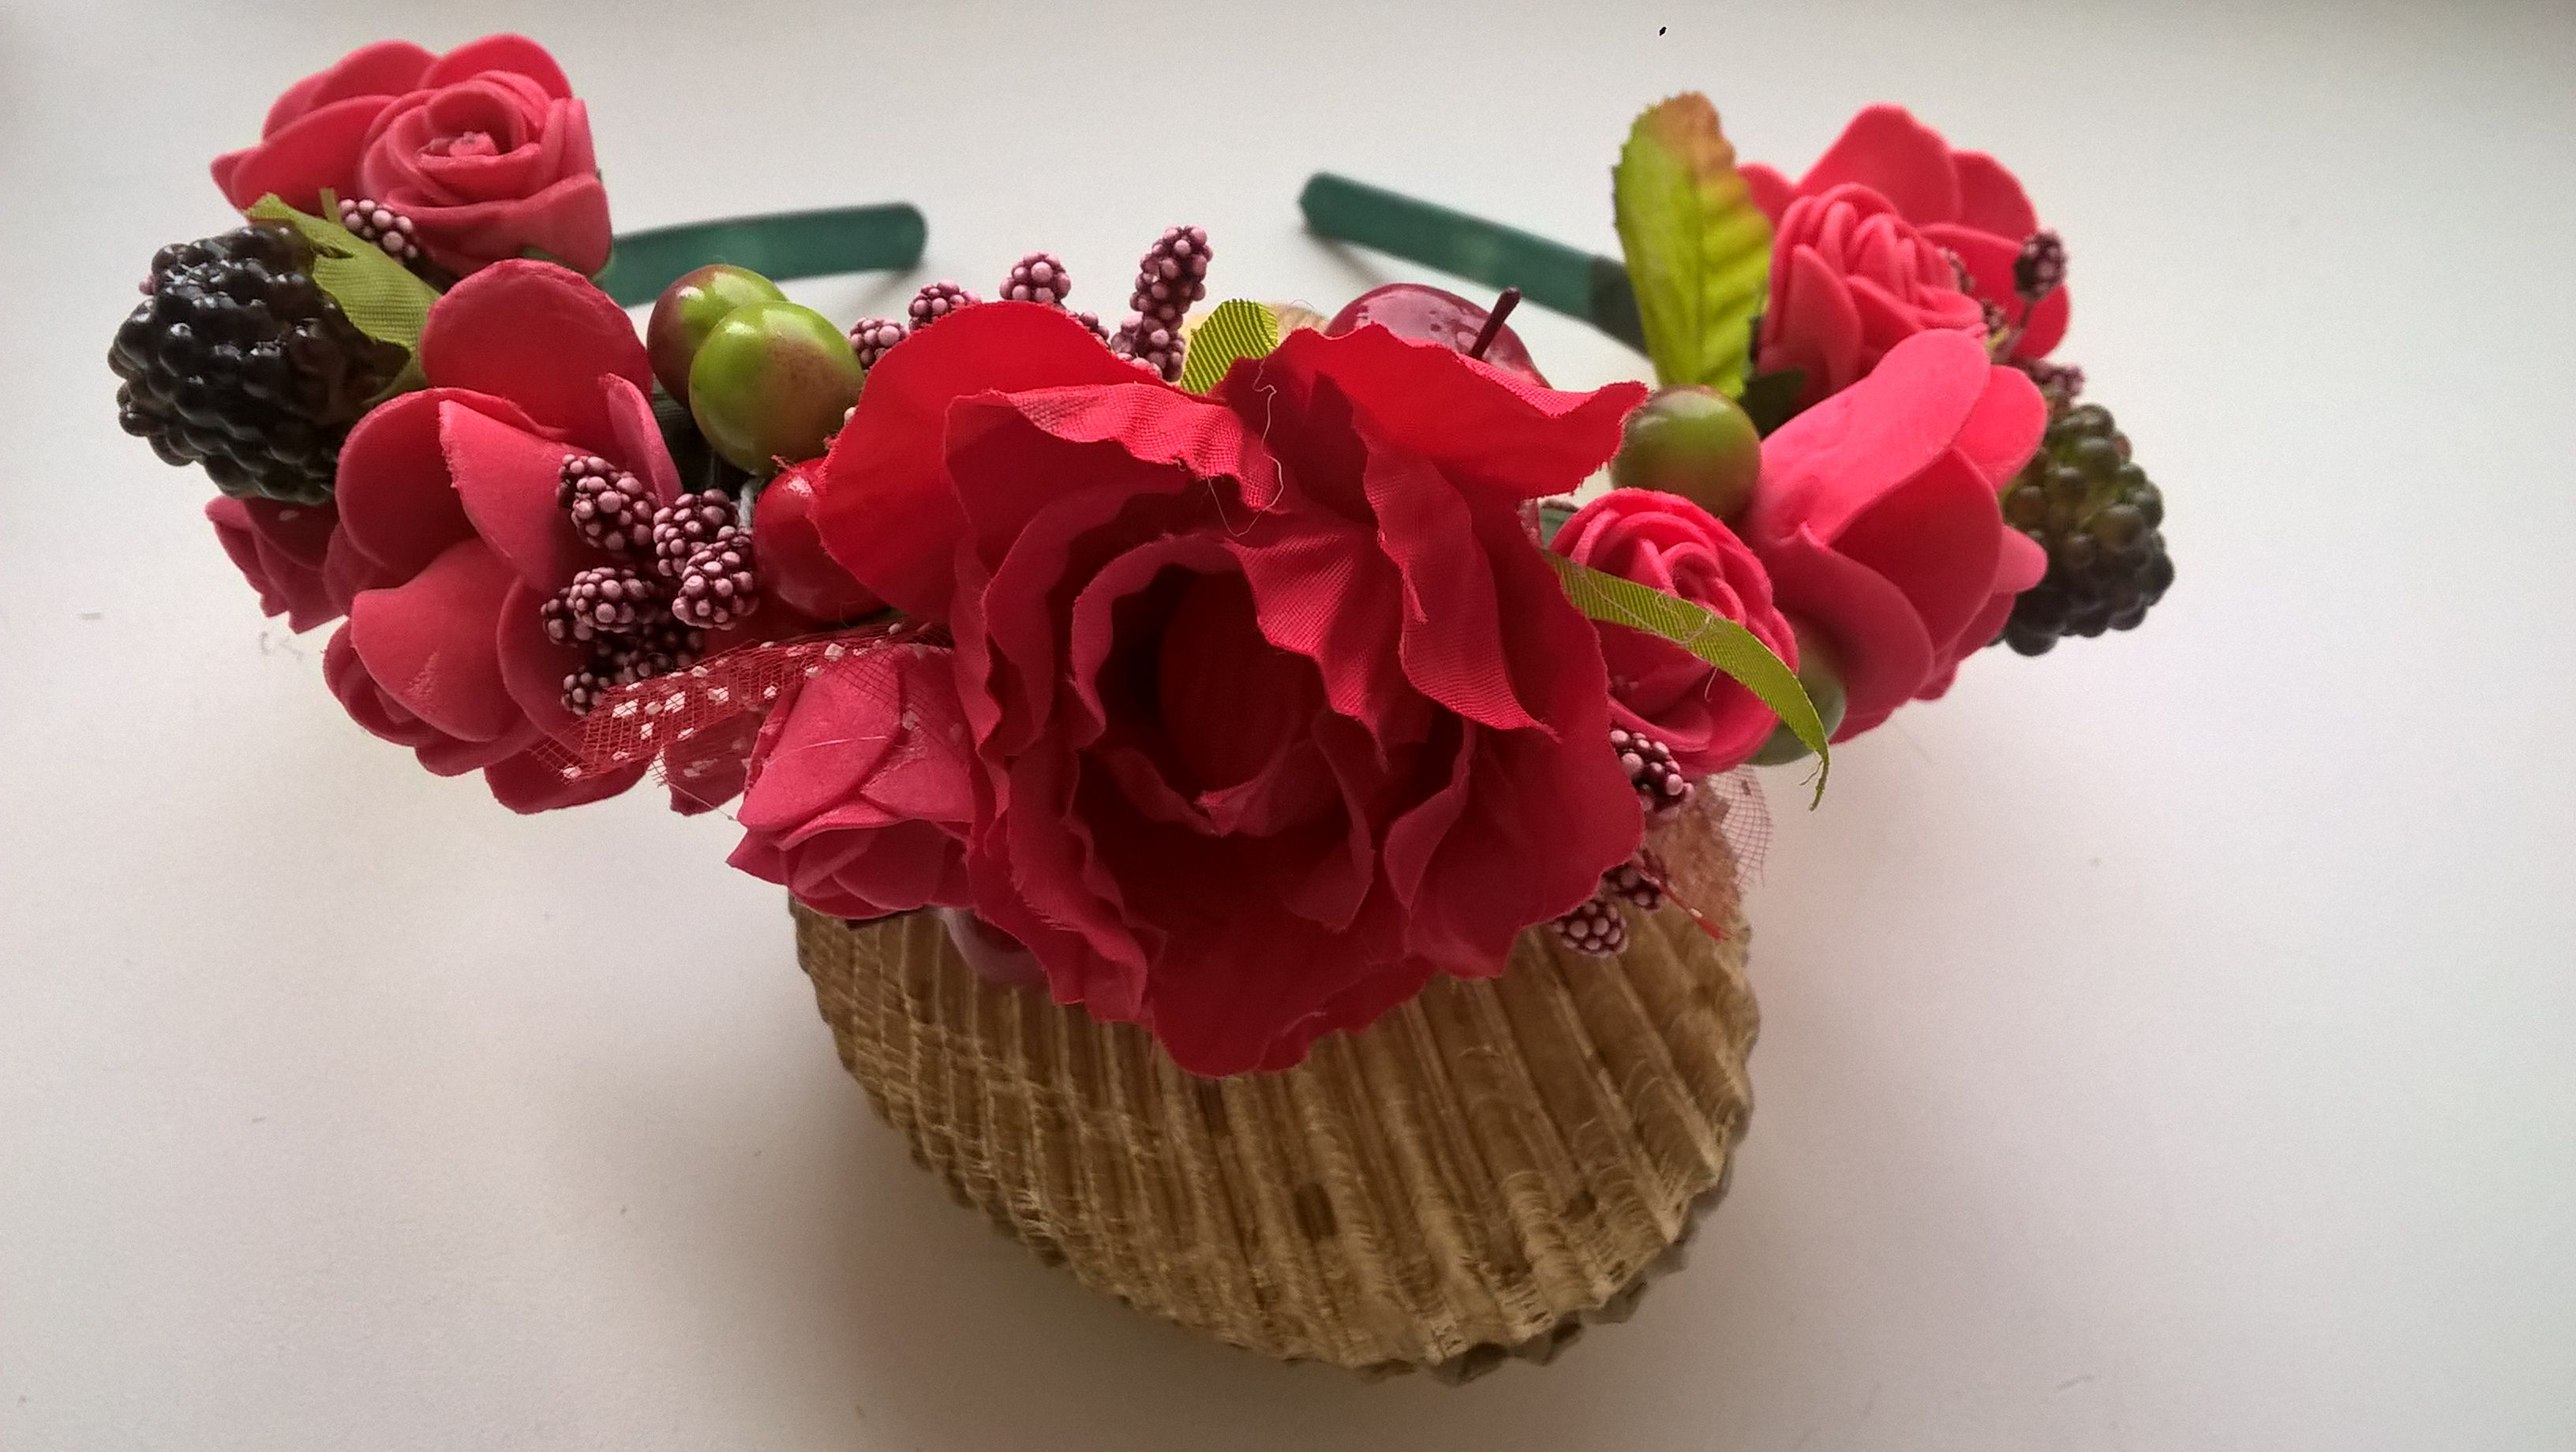 изцветов ягодки ободок дляволос аксессуар венок